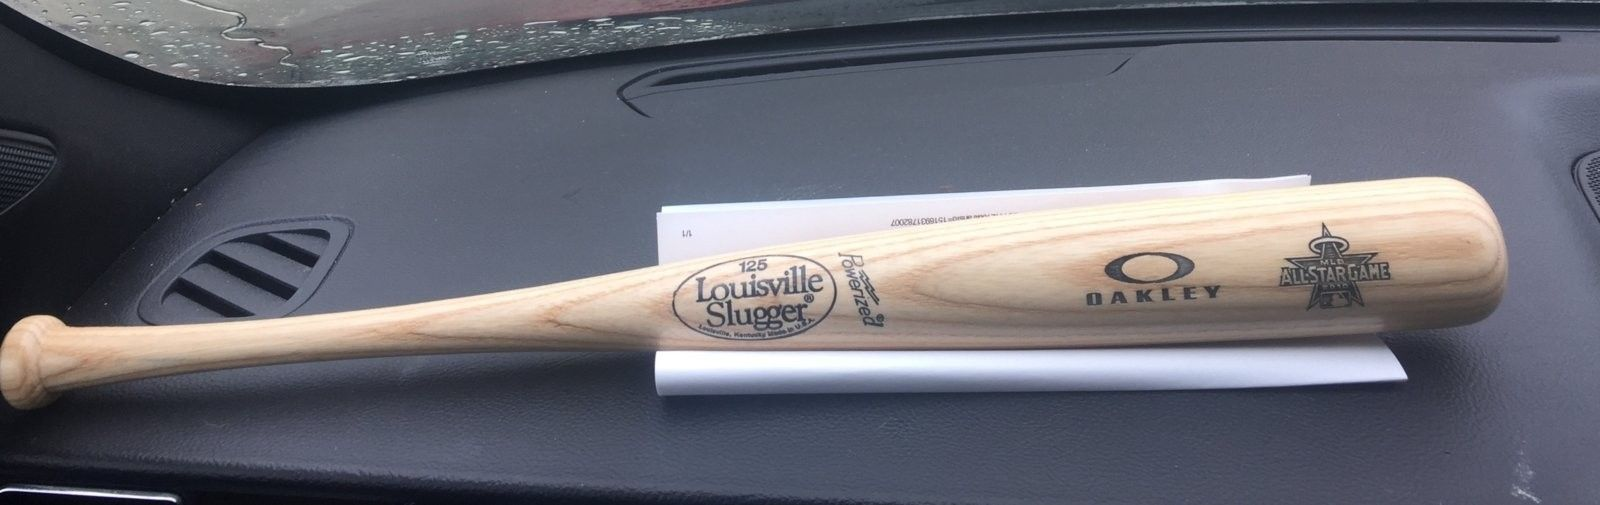 Oakley mini bat 2010 All-star game by Louisville slugger - image.jpeg